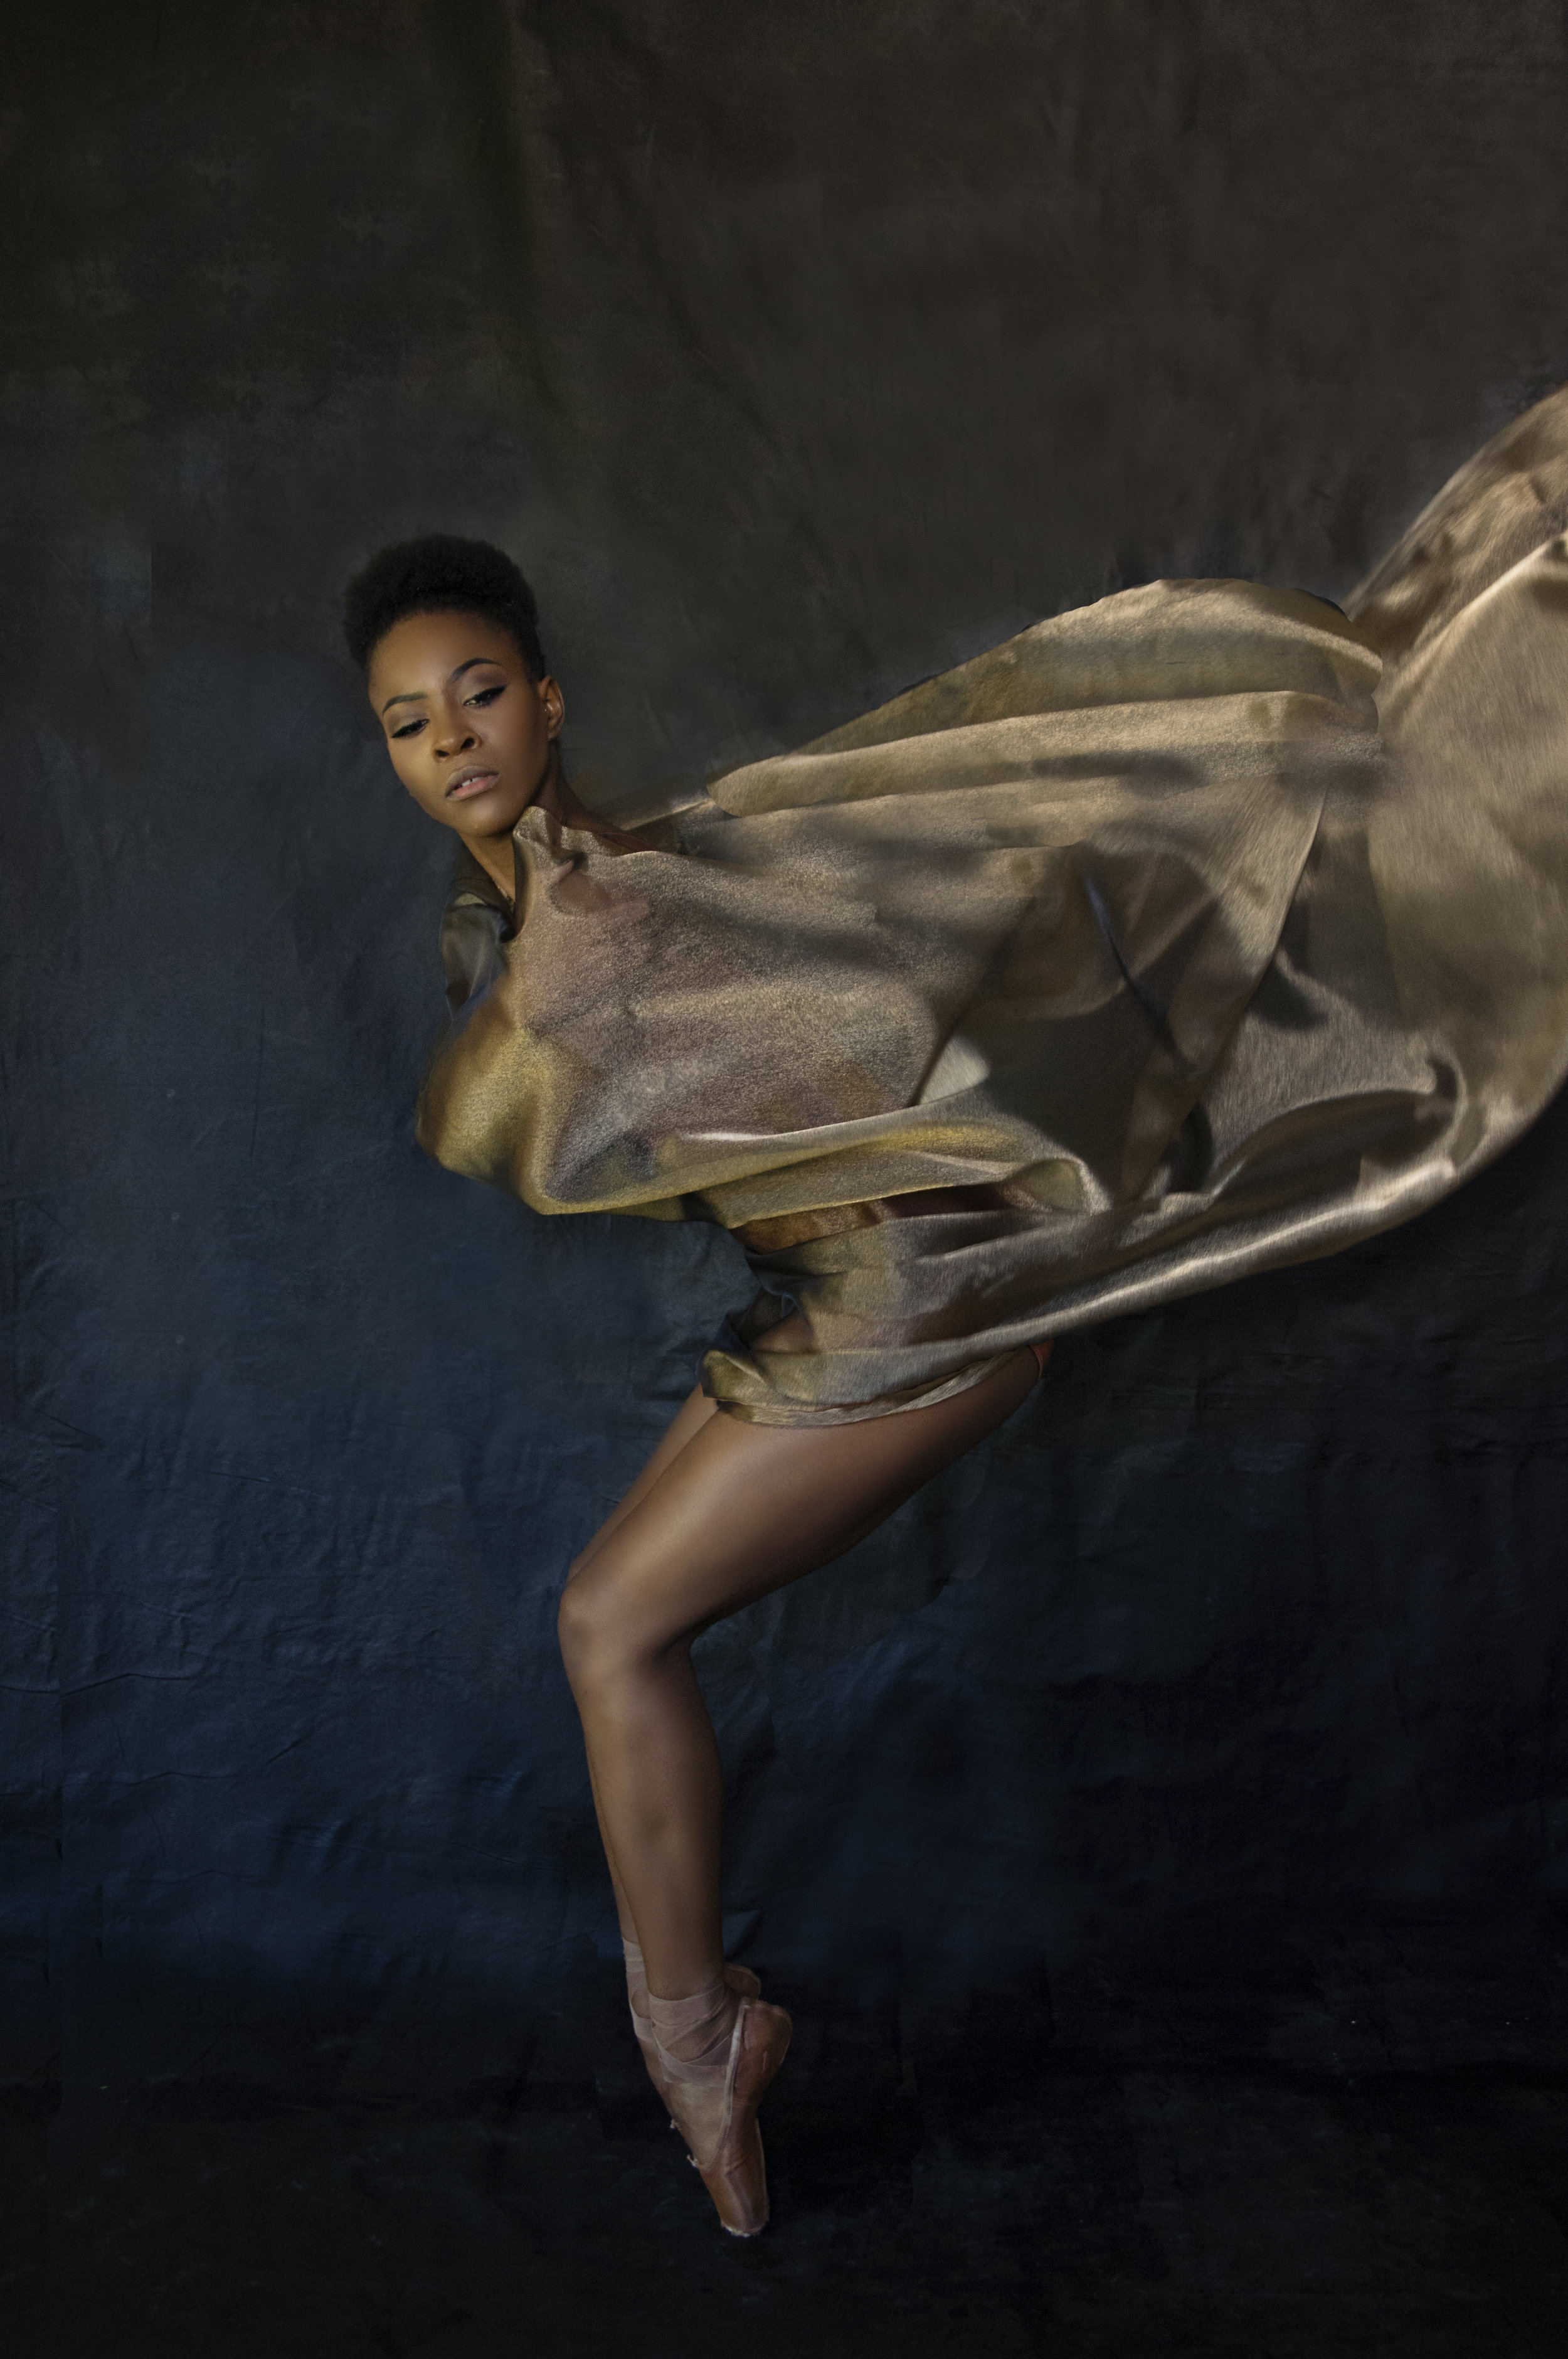 Portrait of a strong dancer